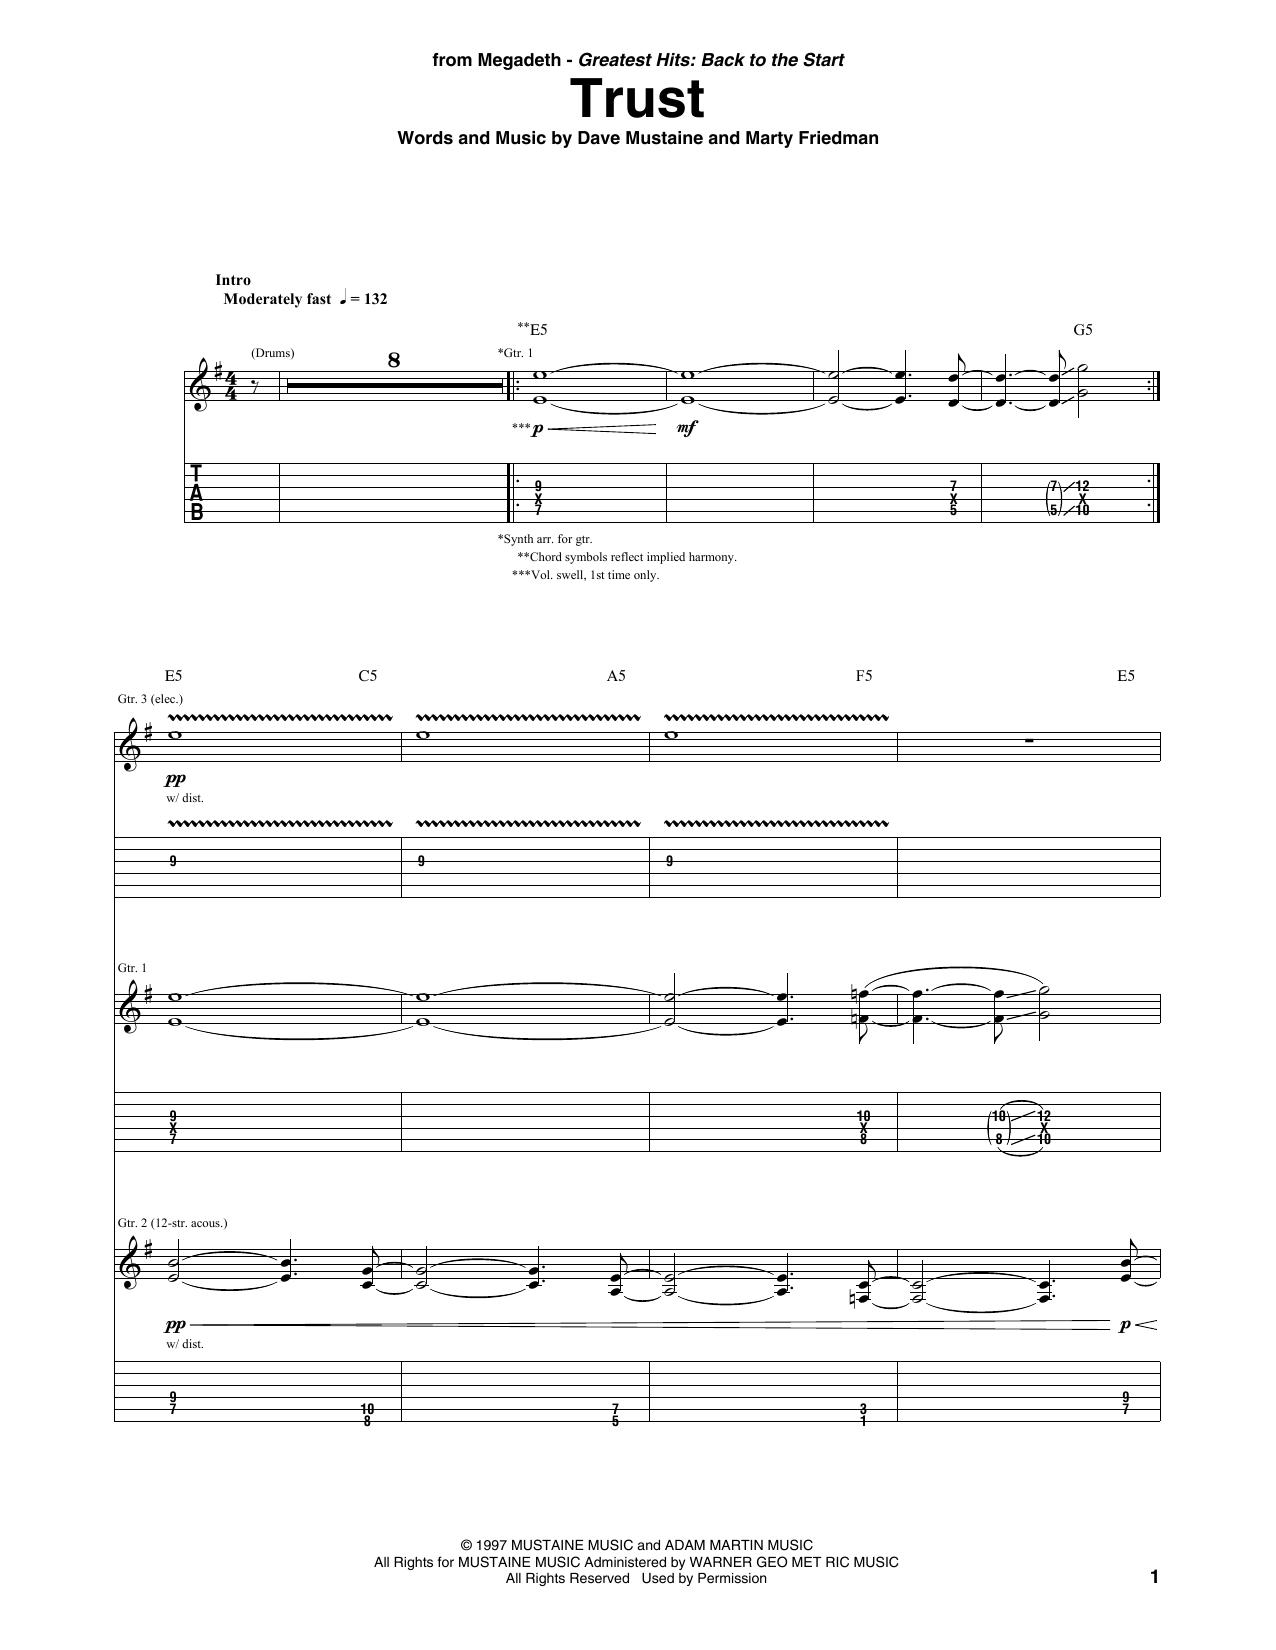 Megadeth 'Trust' Sheet Music Notes, Chords | Download Printable Guitar Tab  - SKU: 403150